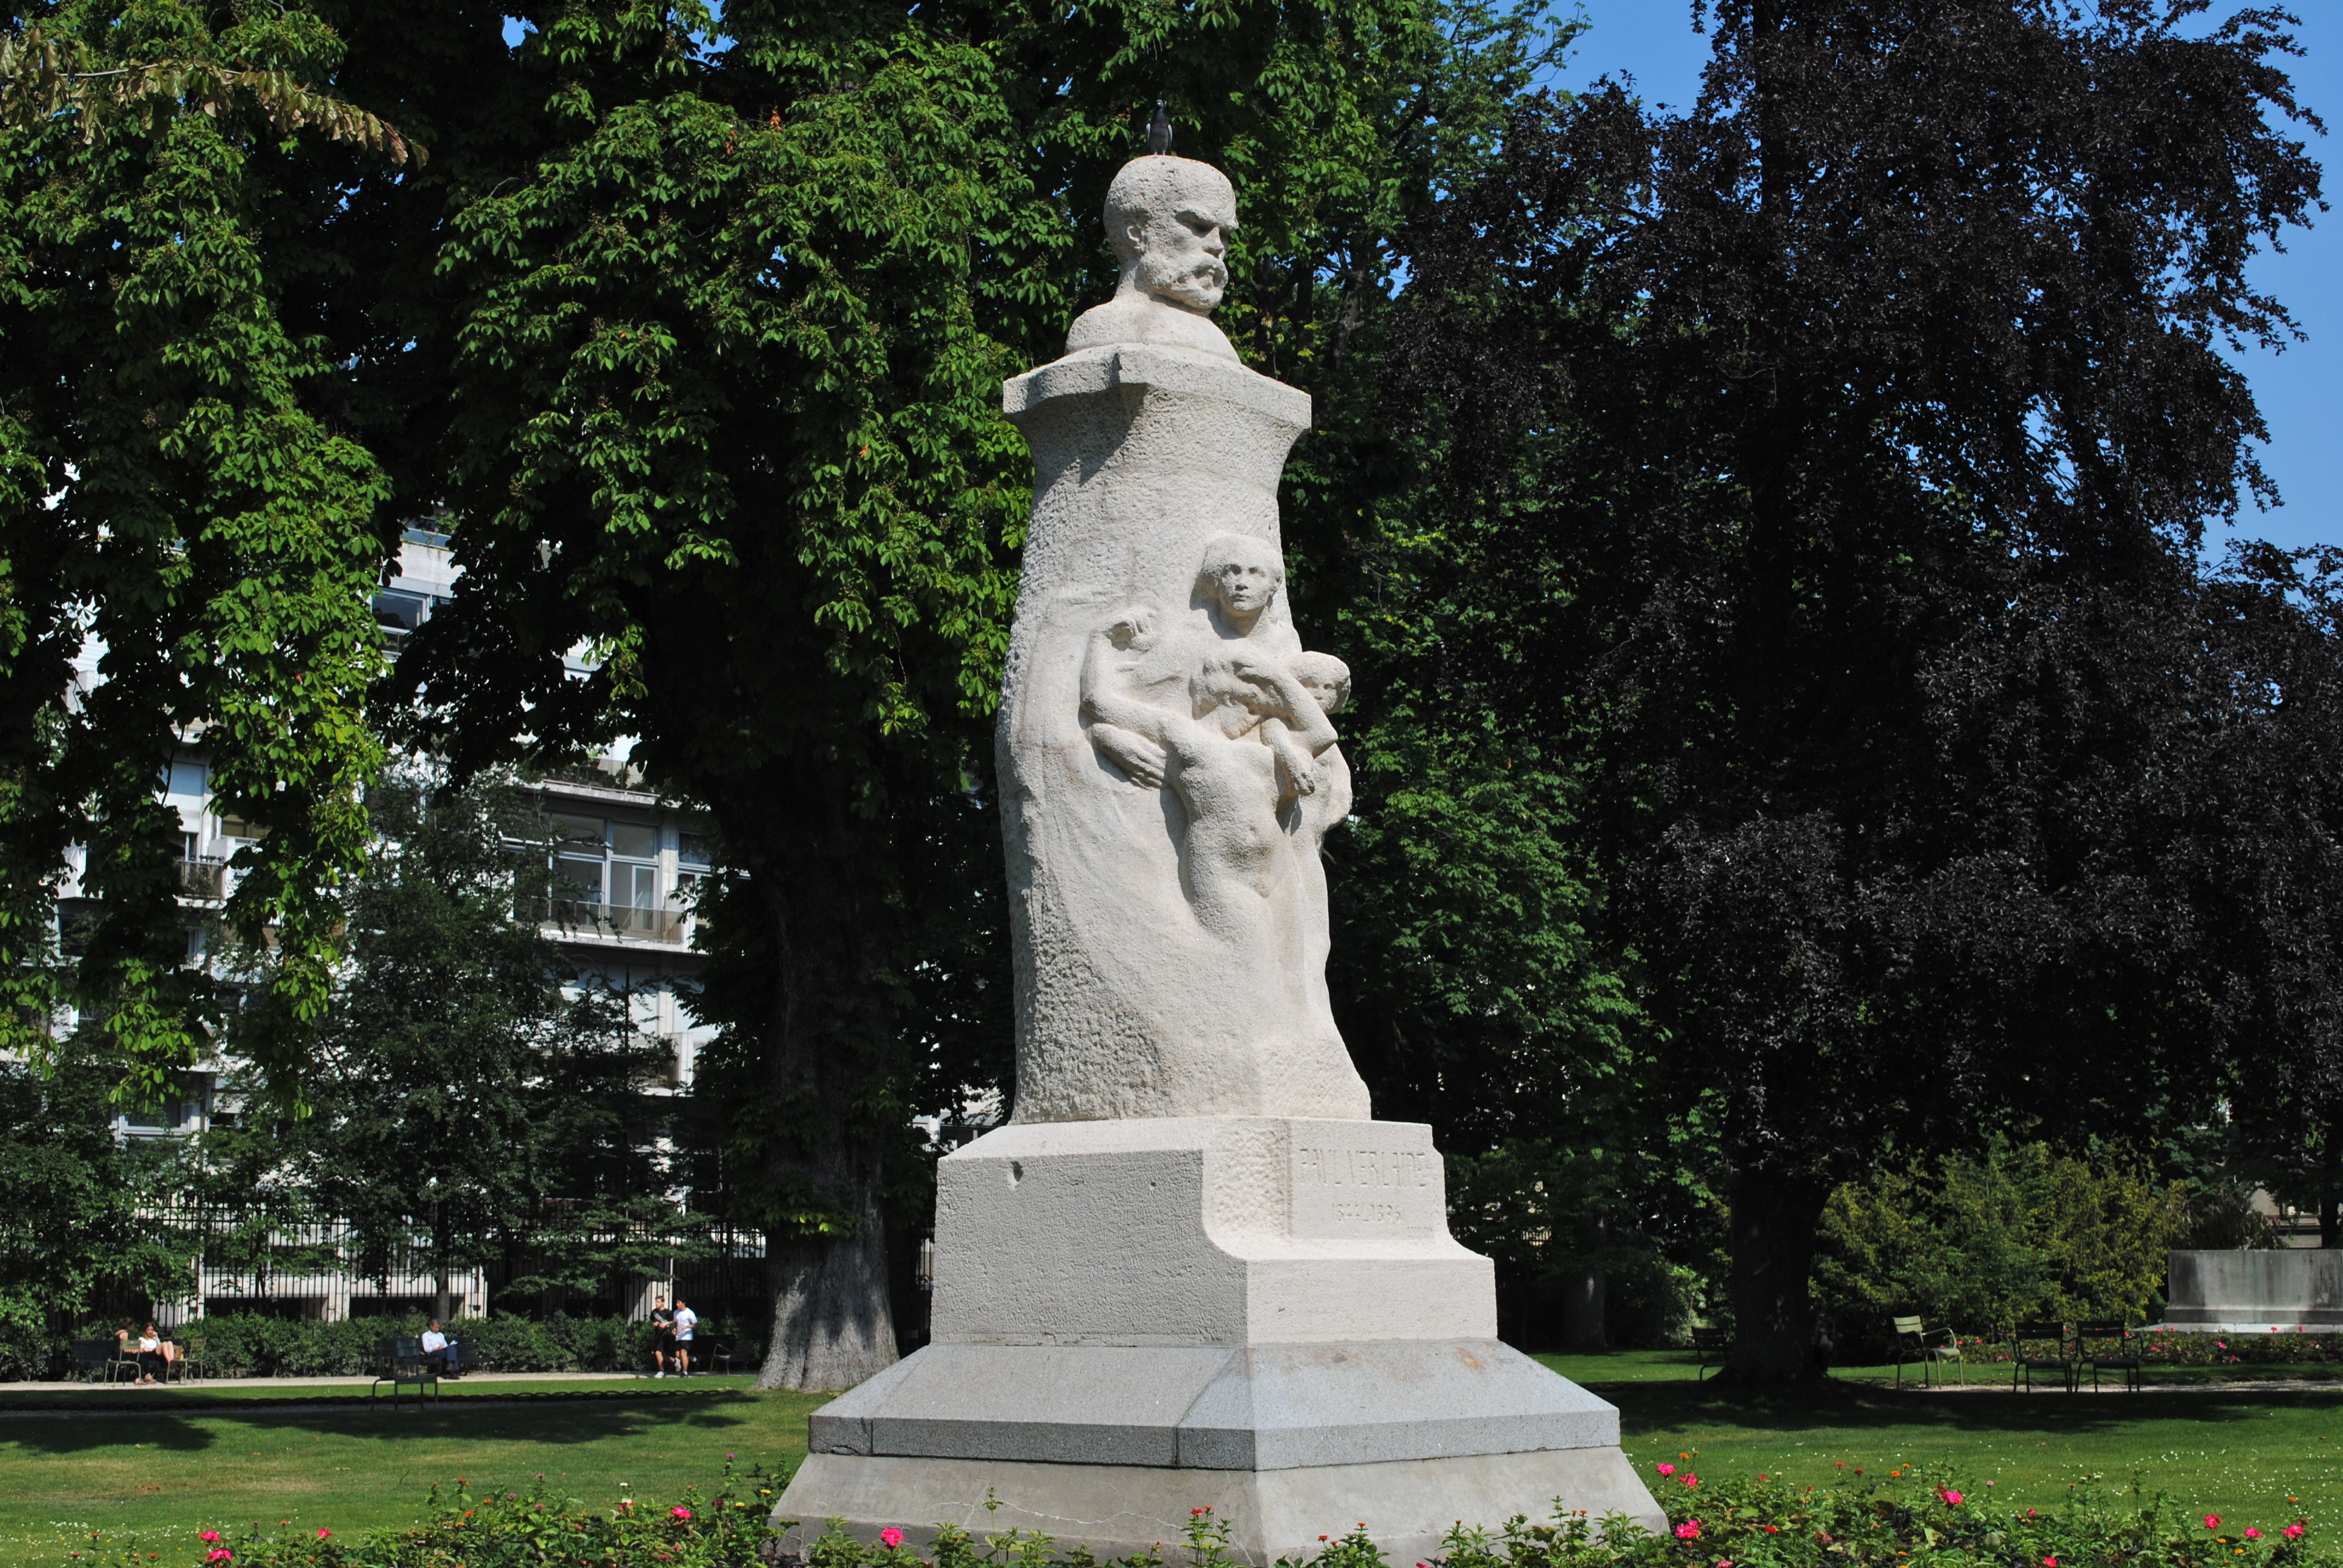 Jardin du luxembourg thiscornerofthewoods for Au jardin du luxembourg